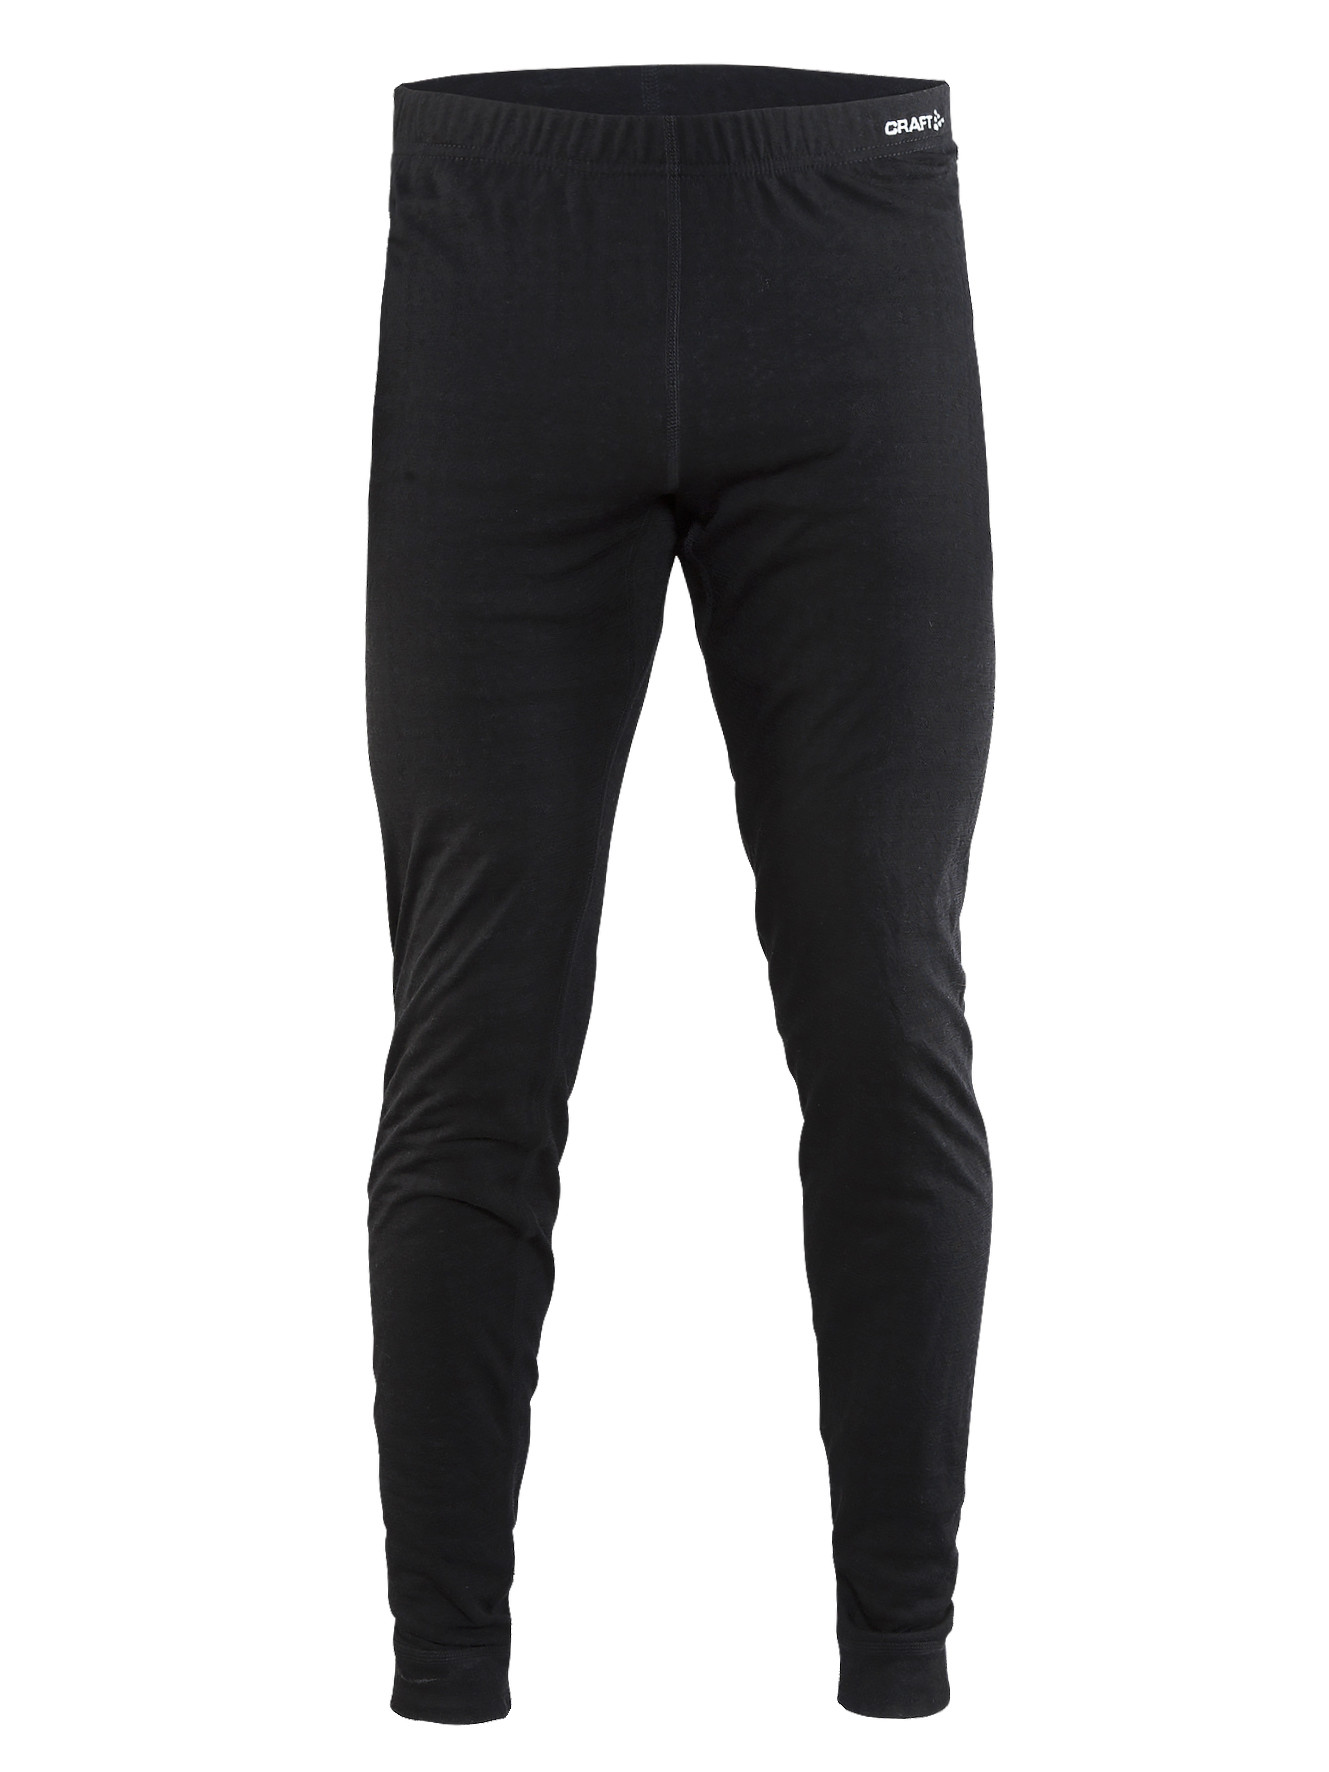 Термоштаны Craft Nordic Wool Pants M Black/Dark Grey Melange M